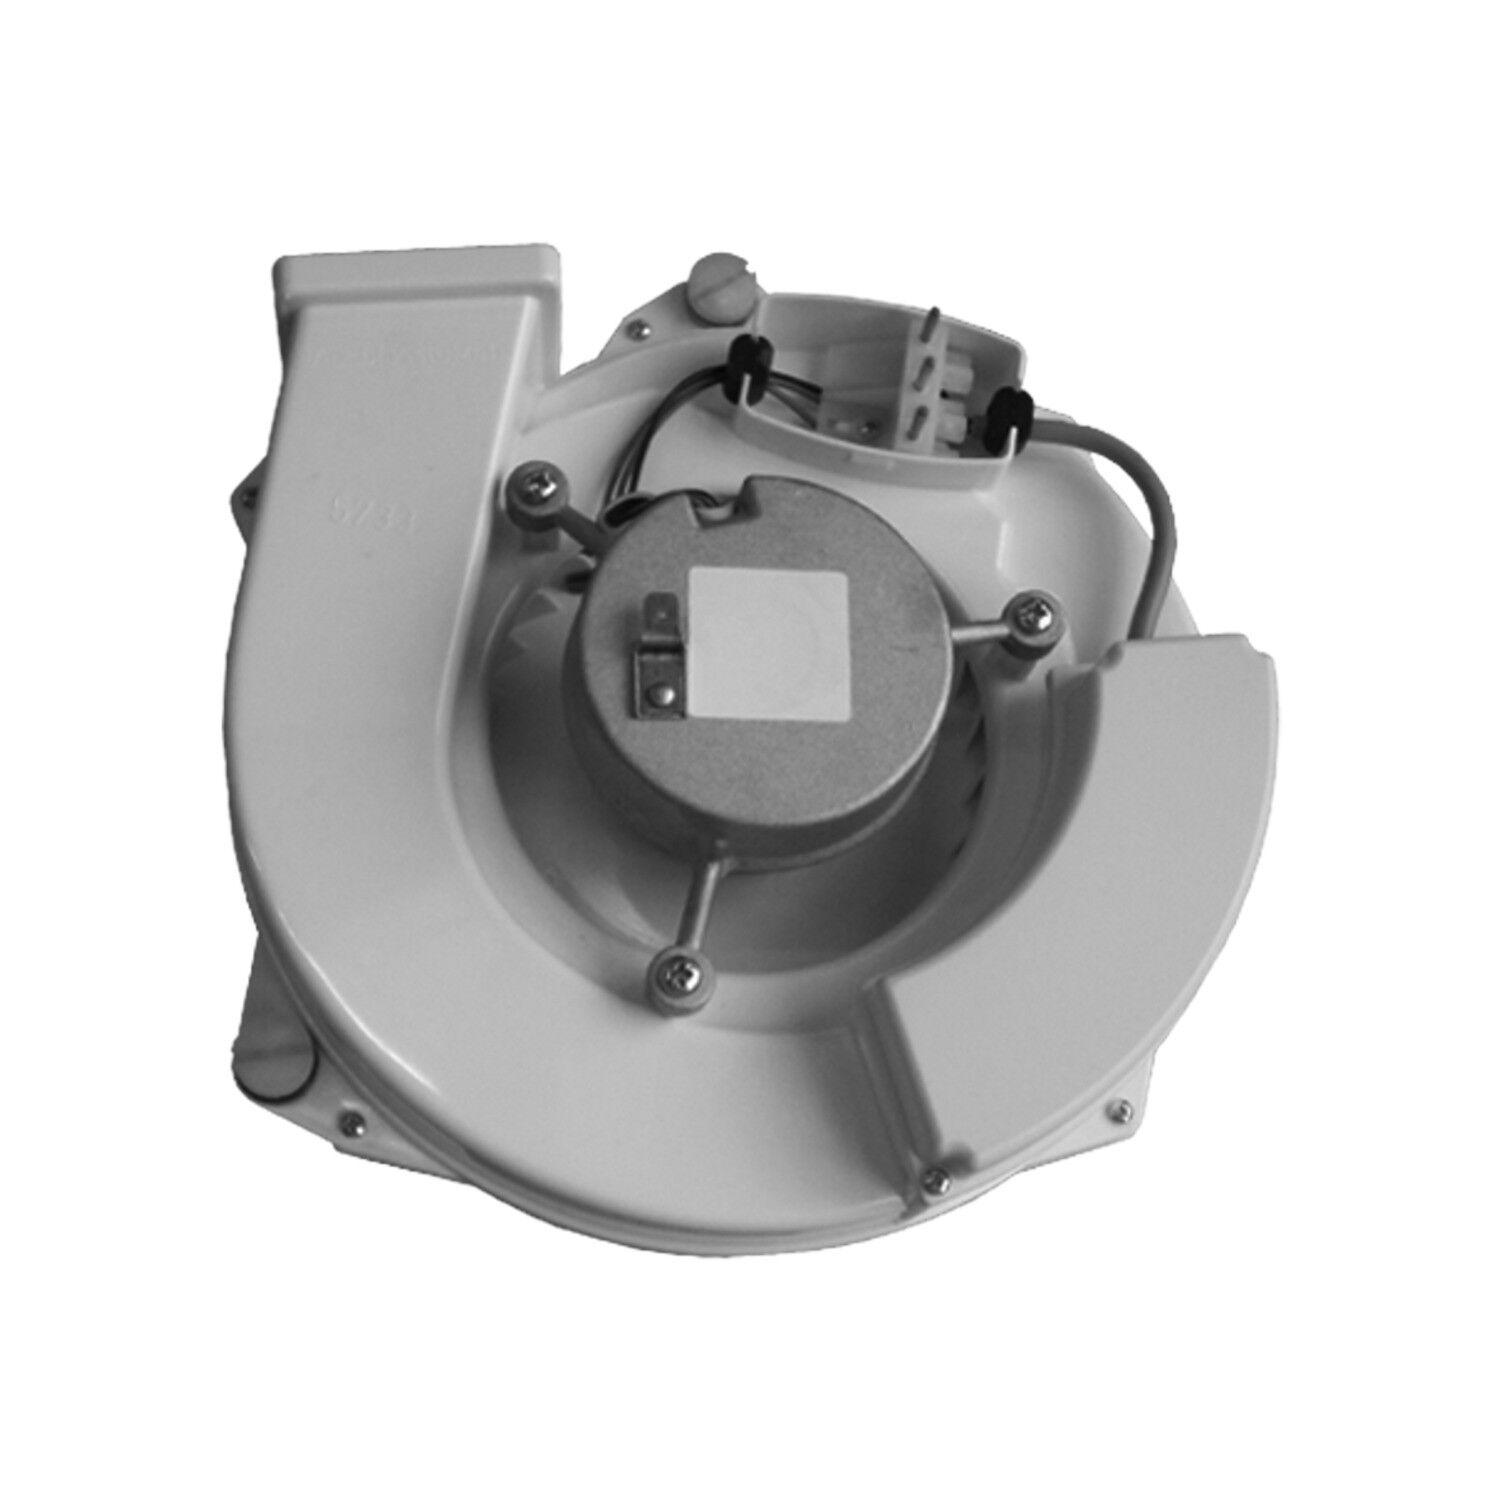 Limodor    Gebläseeinheit   Gebläse f.Lüftungsgeräte Serie ELF 100   00180